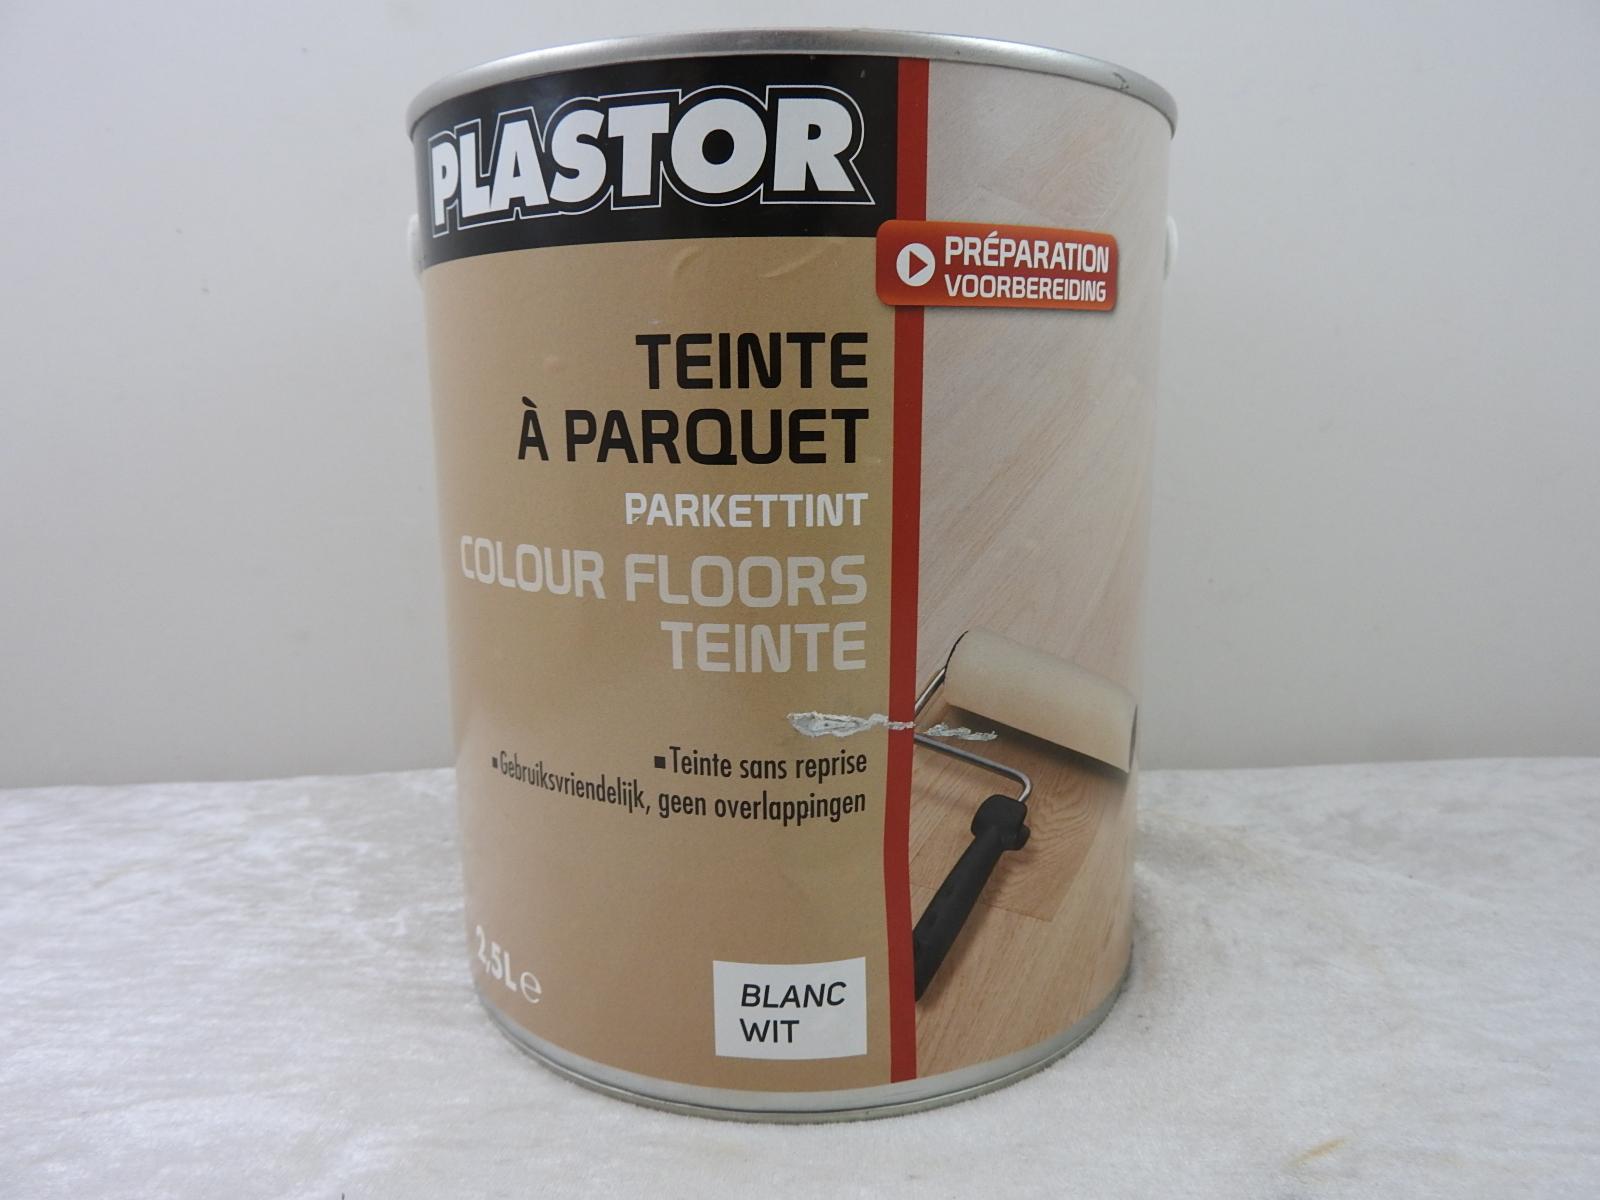 teinte parquet blanc plastor 2 5l plastor teinte plastor blc peinture lasure vernis pas cher. Black Bedroom Furniture Sets. Home Design Ideas